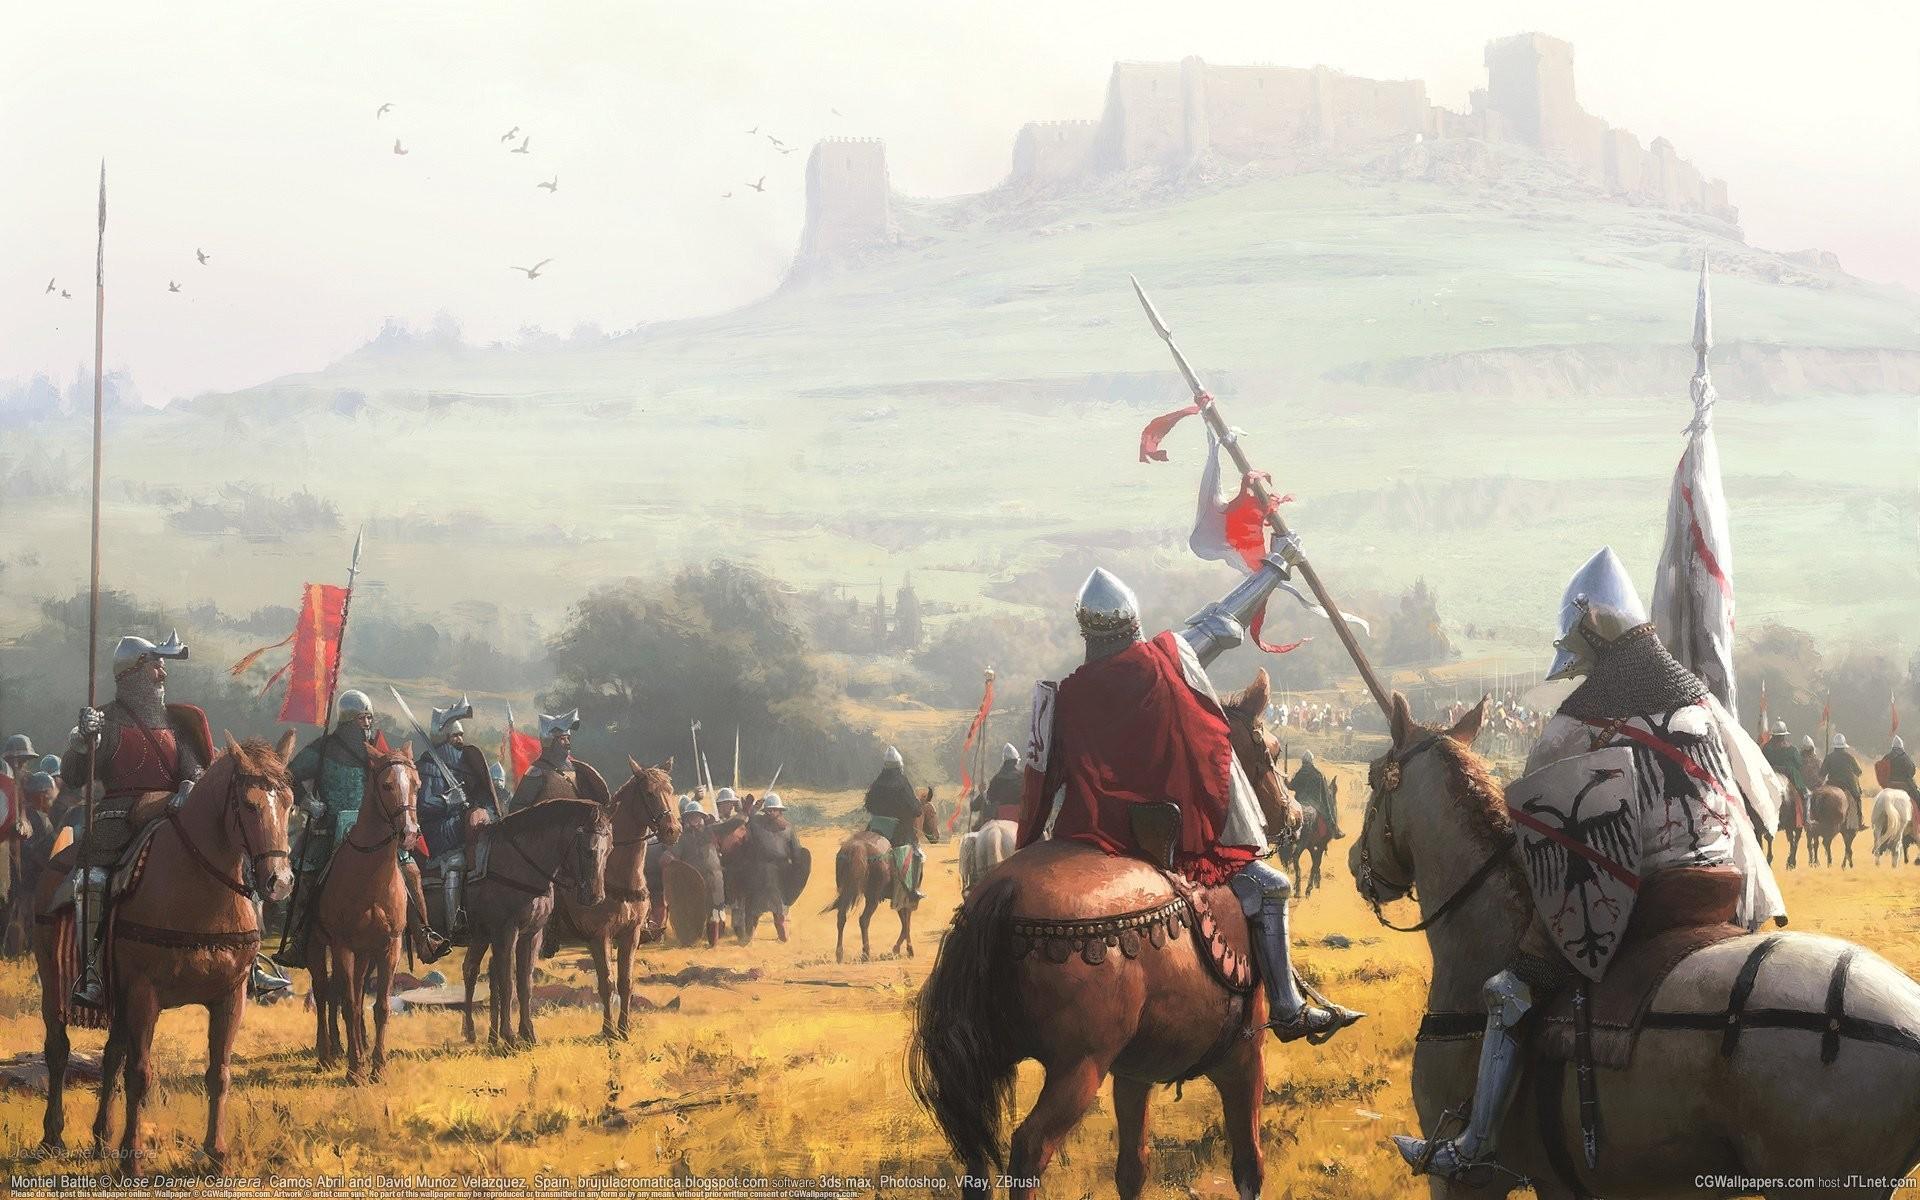 jose daniel cabrera montiel battle cg wallpapers middle ages castle knights  horses middle ages castle hill